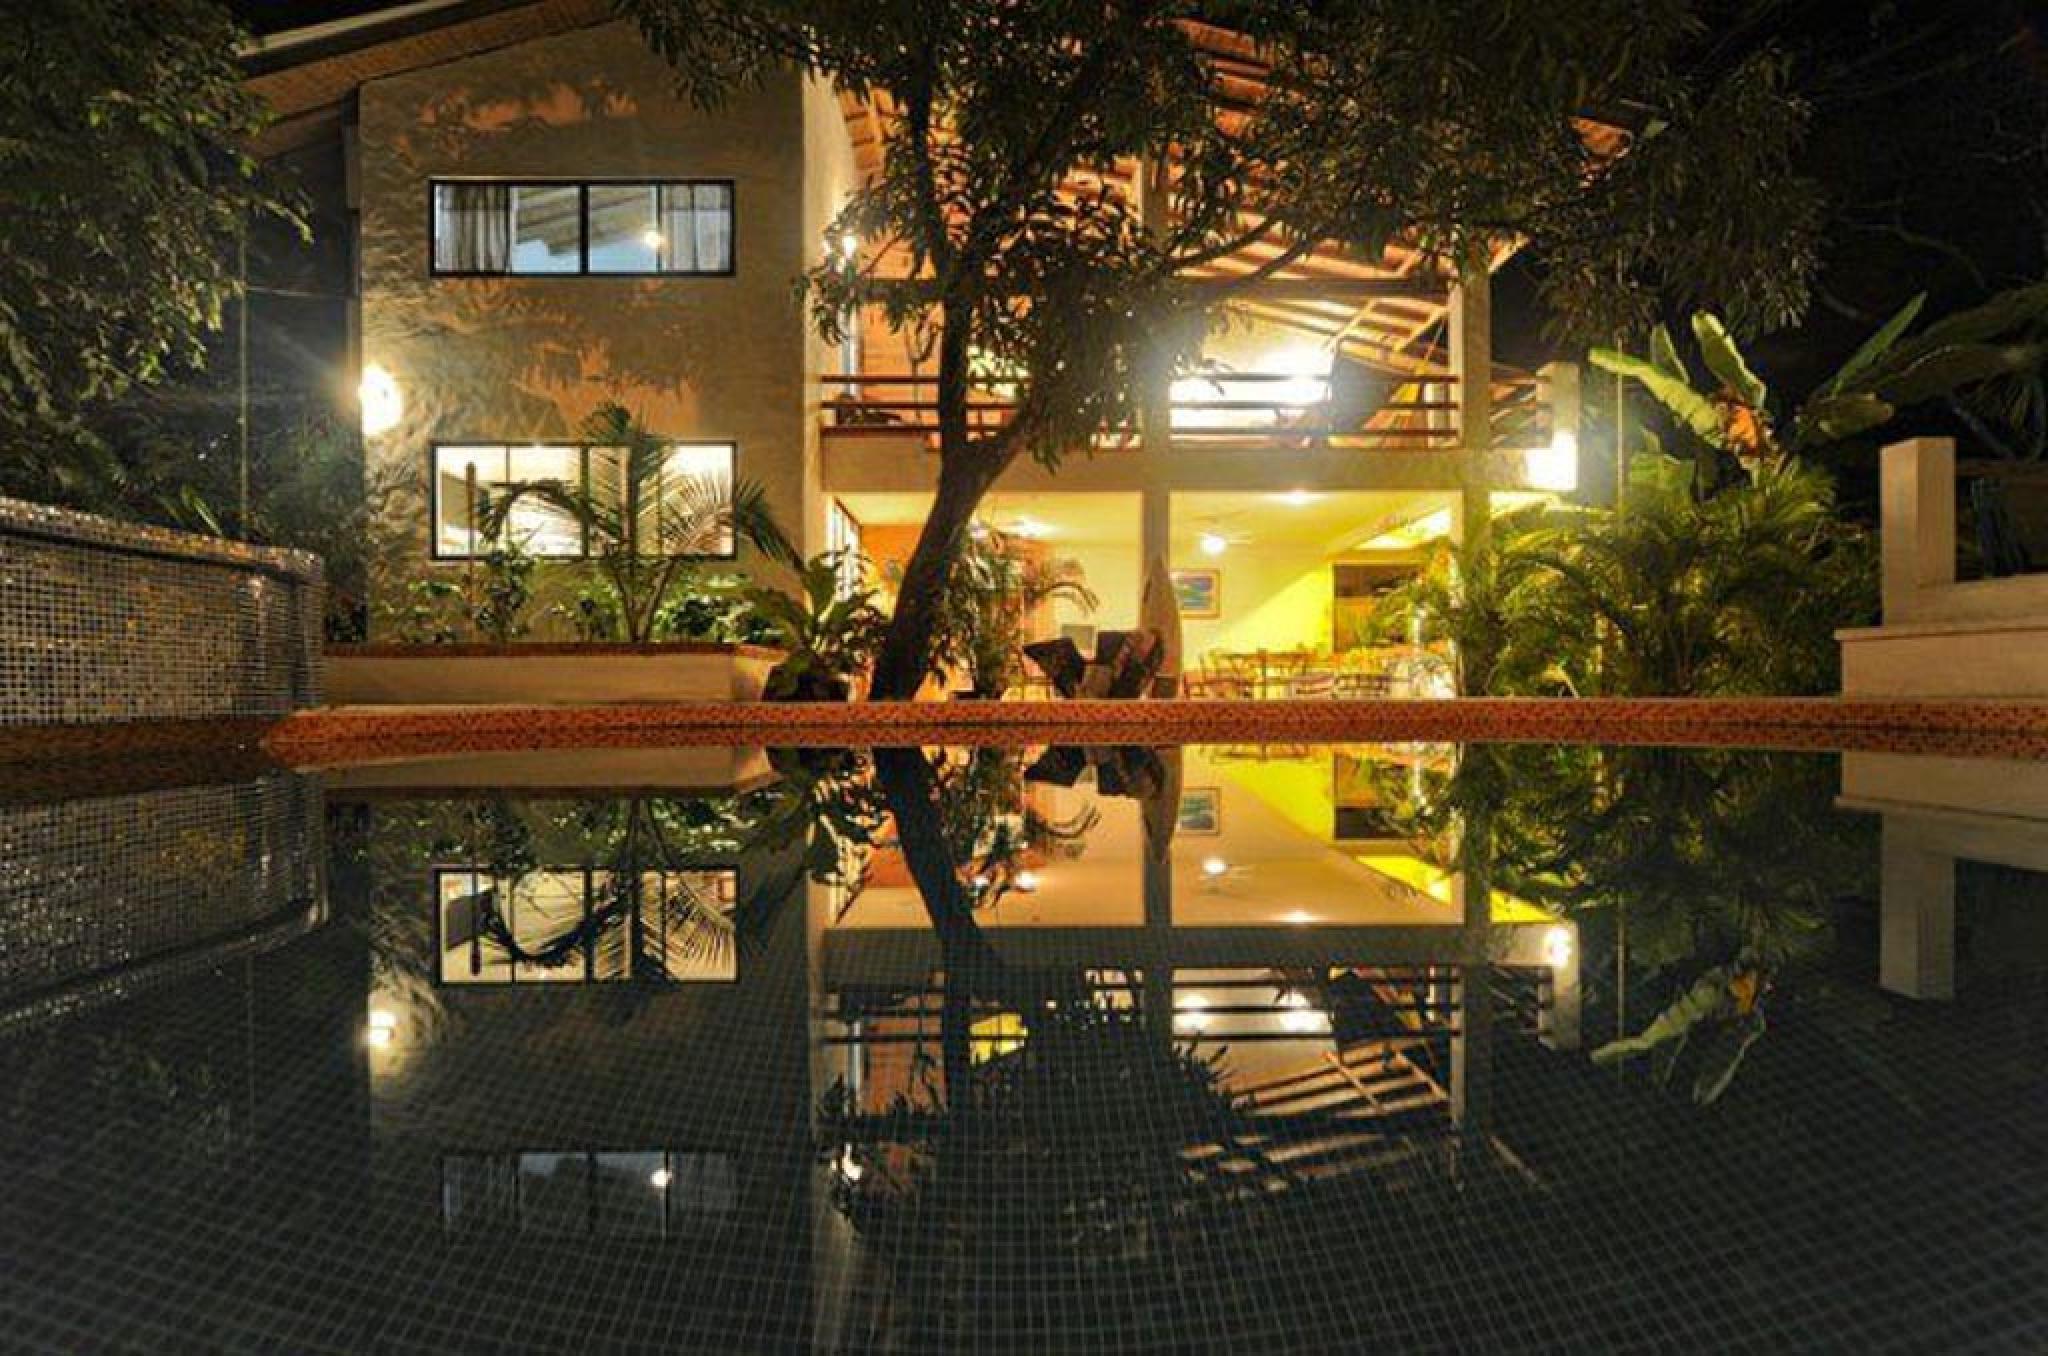 Atrapasueños Lodge